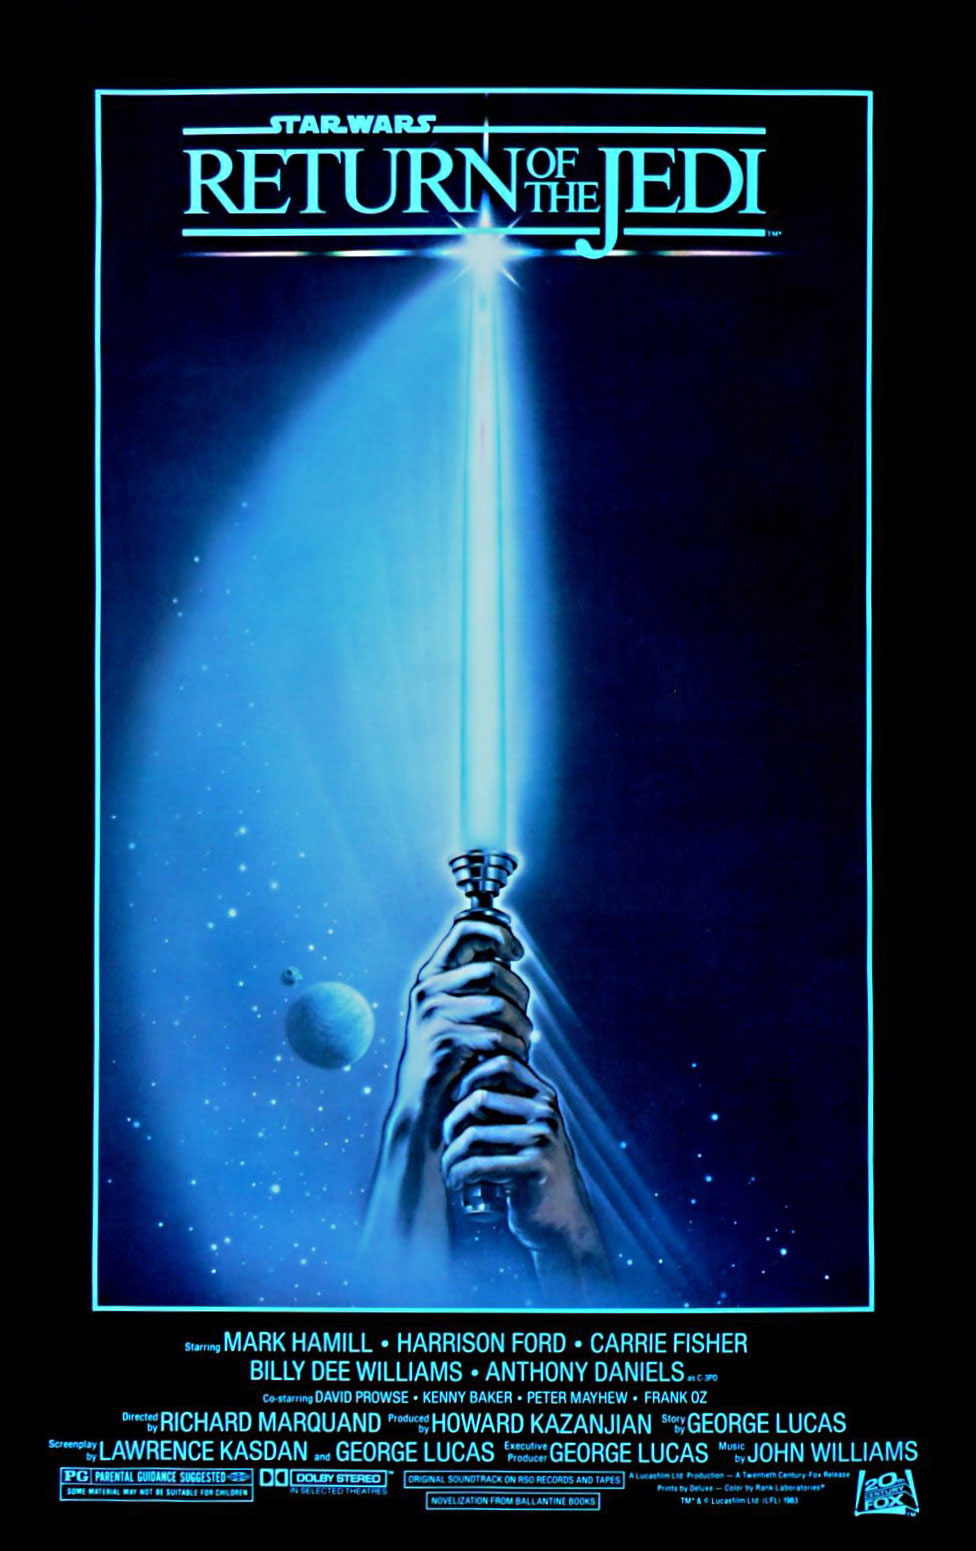 Star-Wars-Return-Of-The-Jedi-1983-Style-A-by-Tim-Reamer.jpg